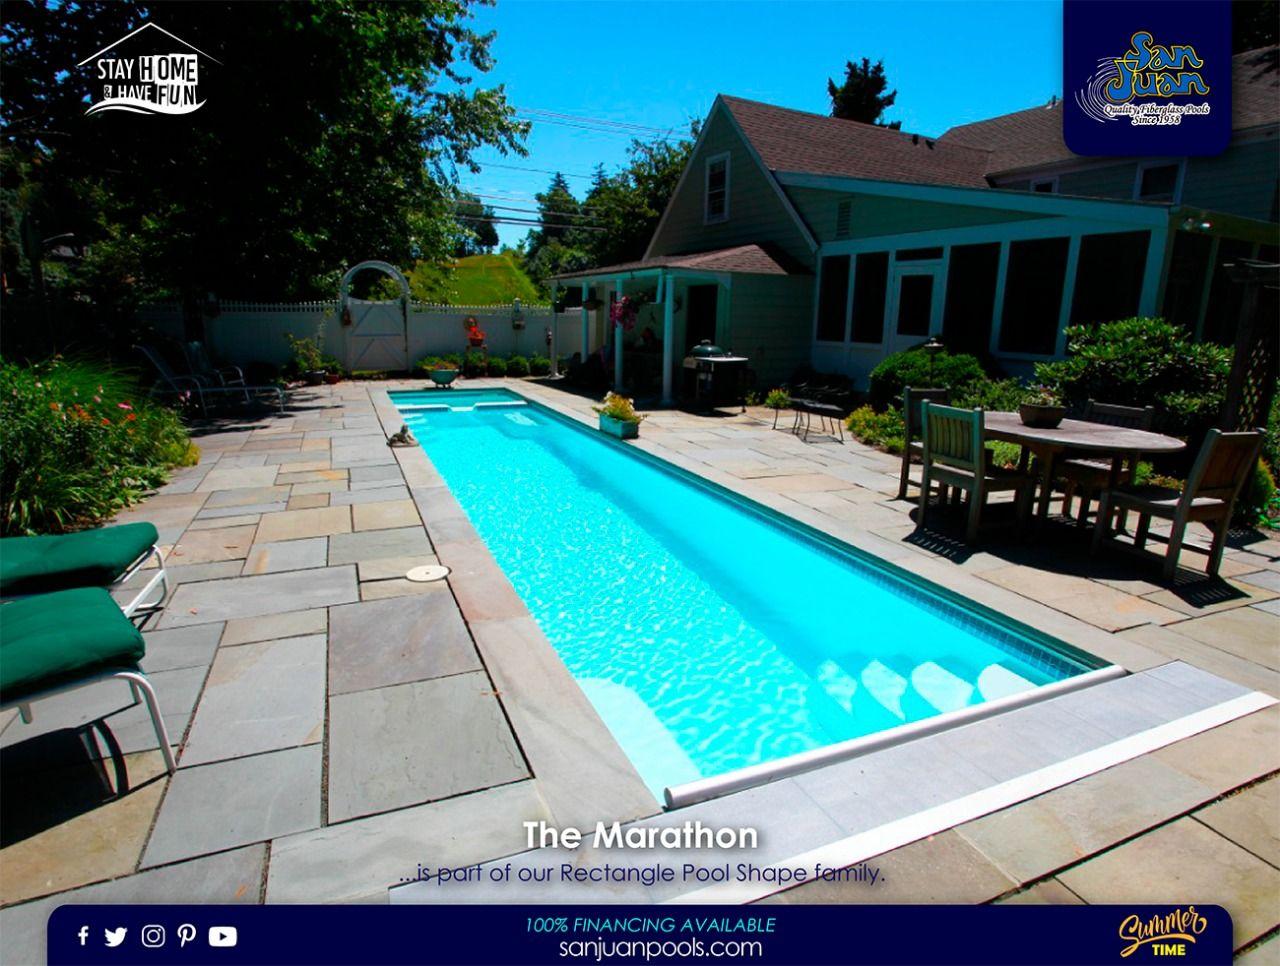 The Marathon San Juan Pools Lap Swimming Pool Shapes Fiberglass Swimming Pools